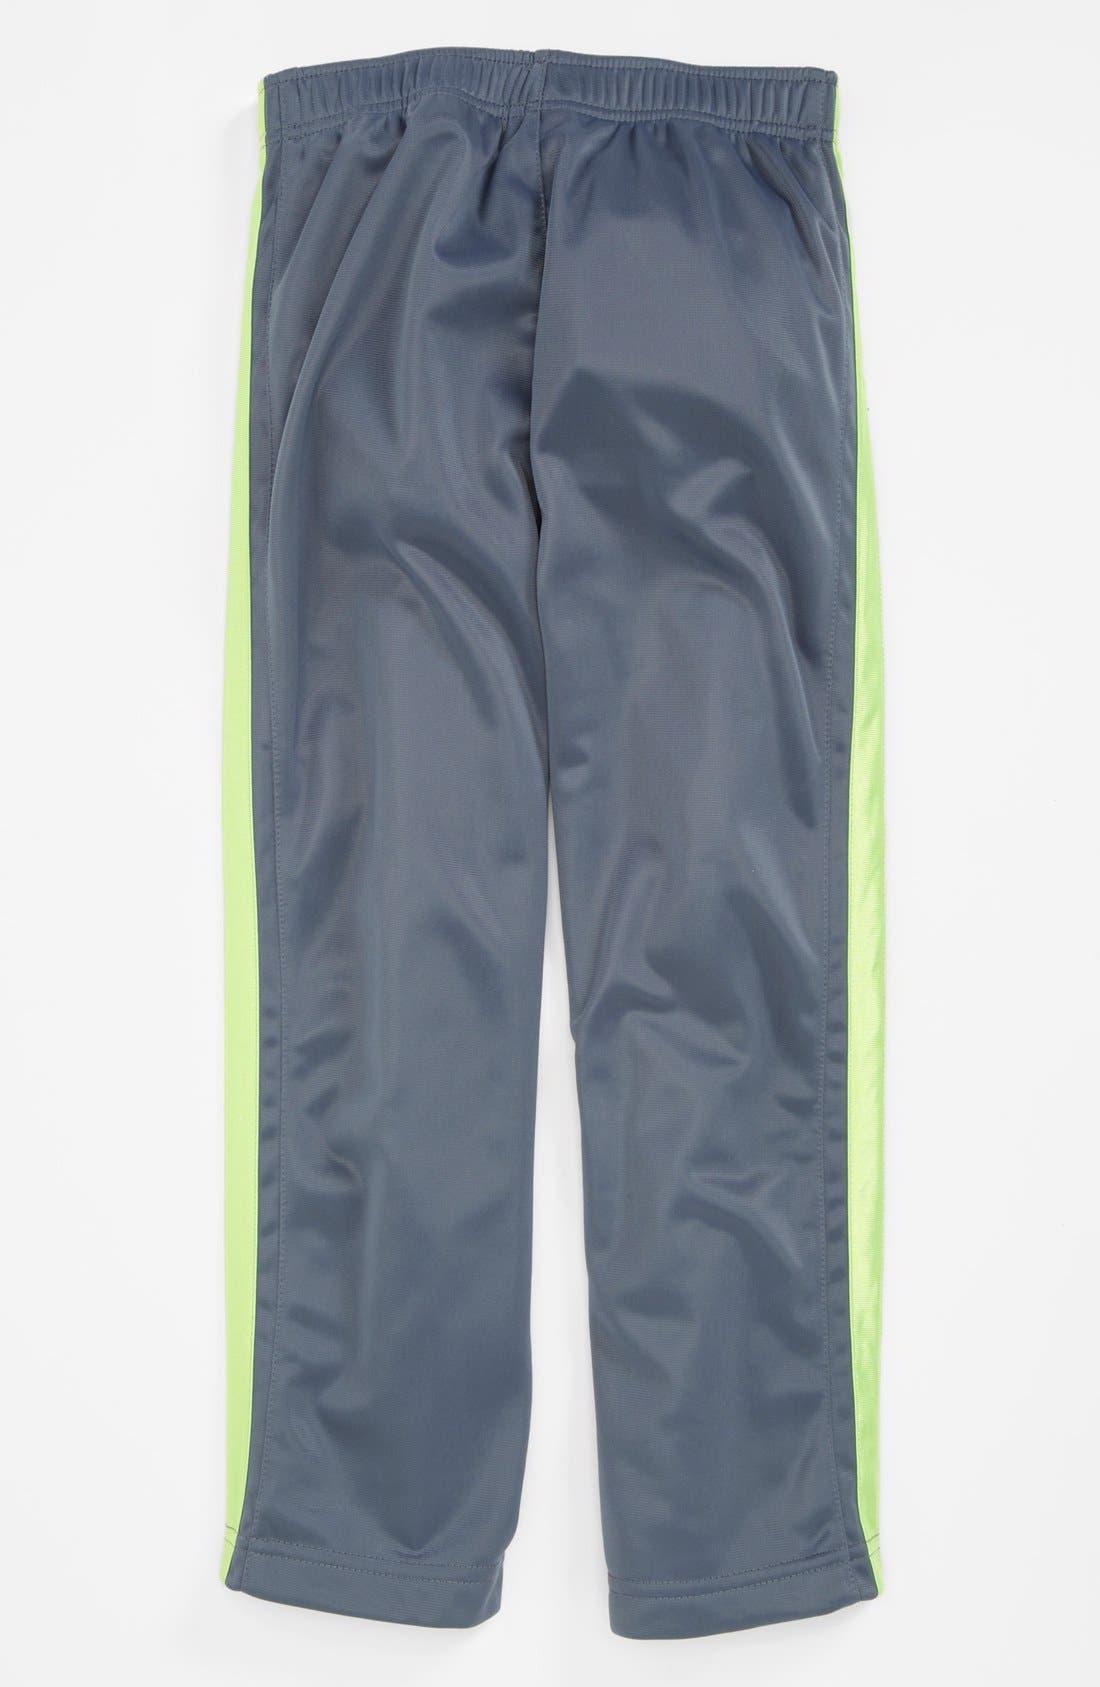 Alternate Image 1 Selected - Nike 'OT' Pants (Little Boys)